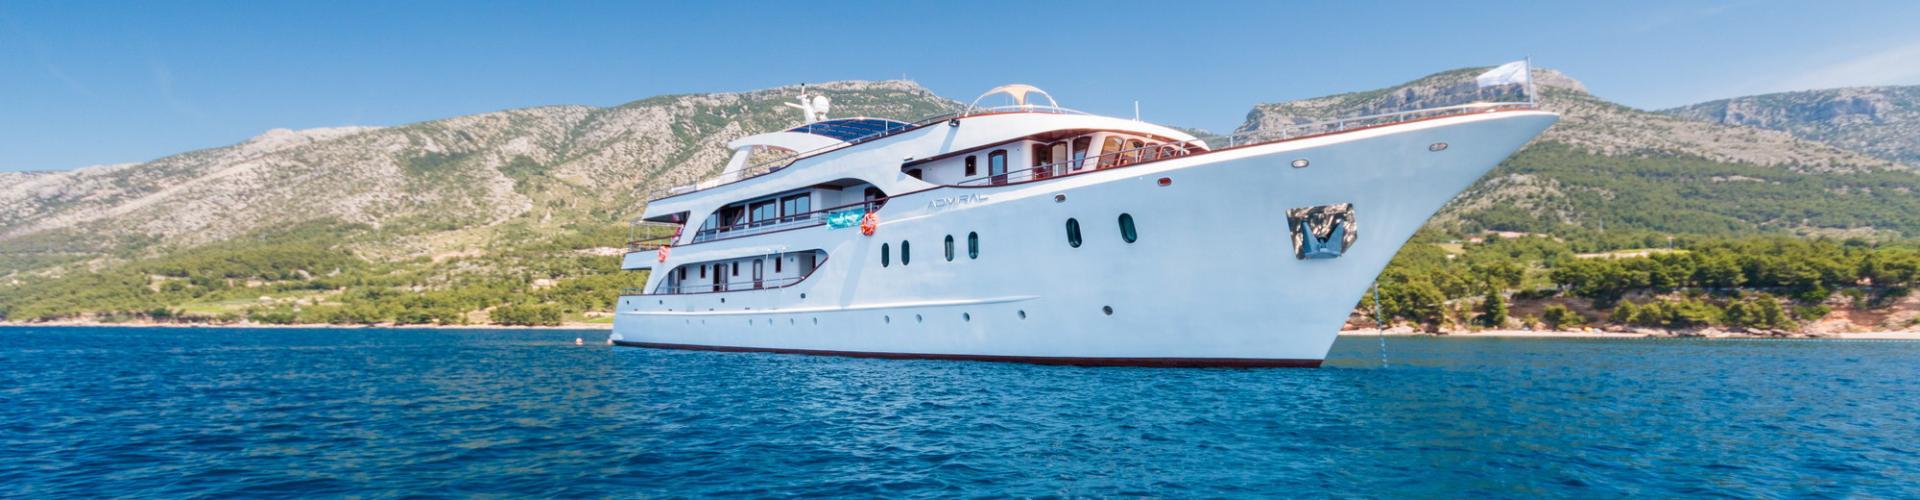 motor boat Deluxe cruiser MV Admiral